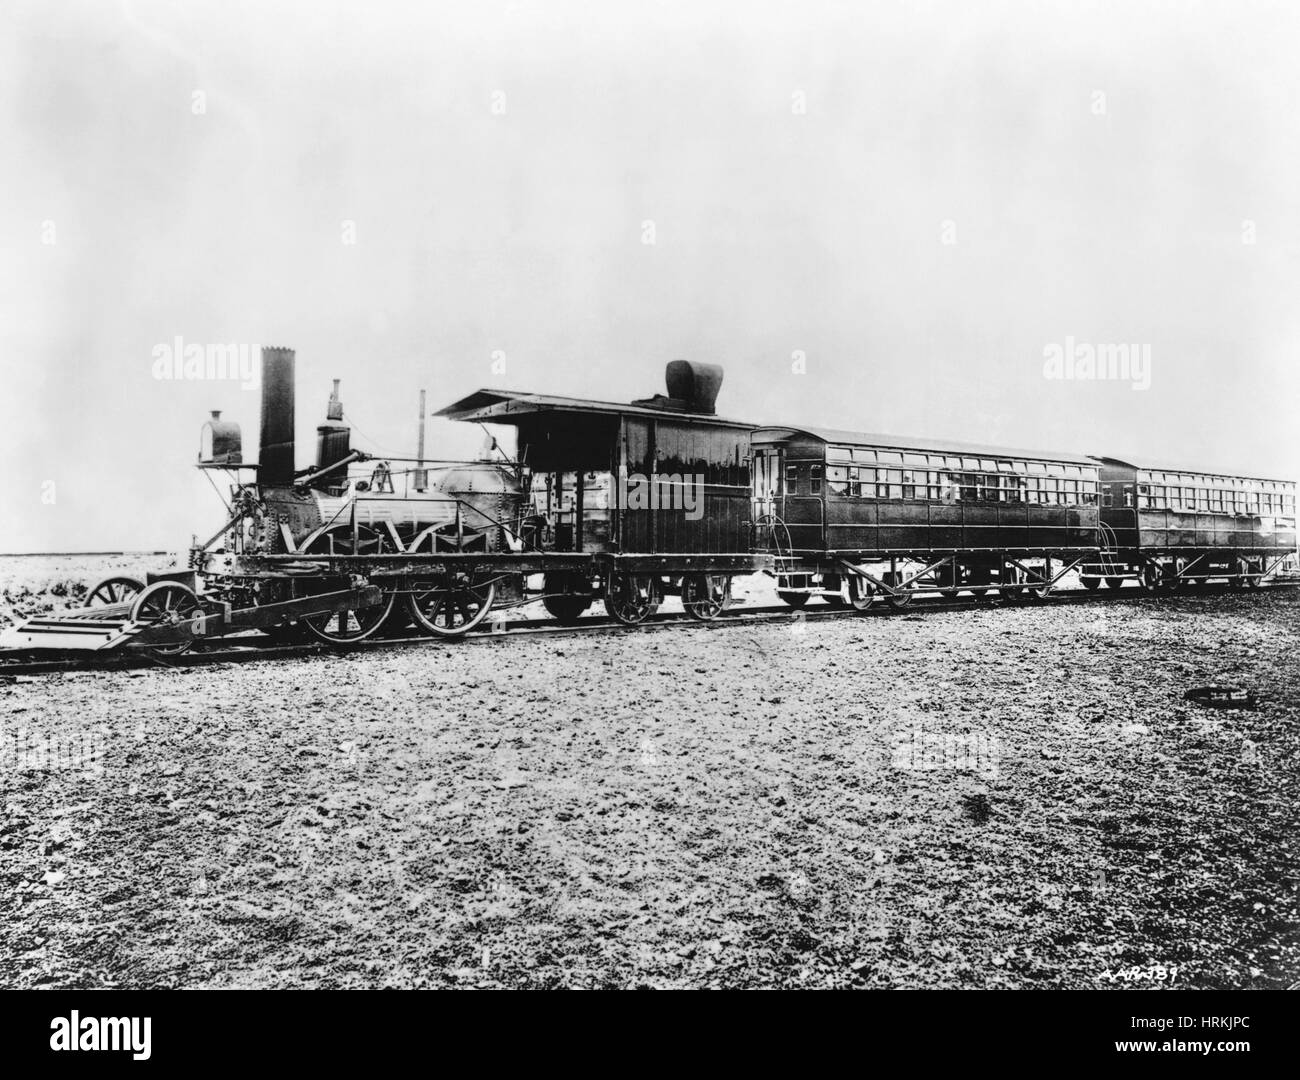 19th Century 'John Bull' Locomotive - Stock Image